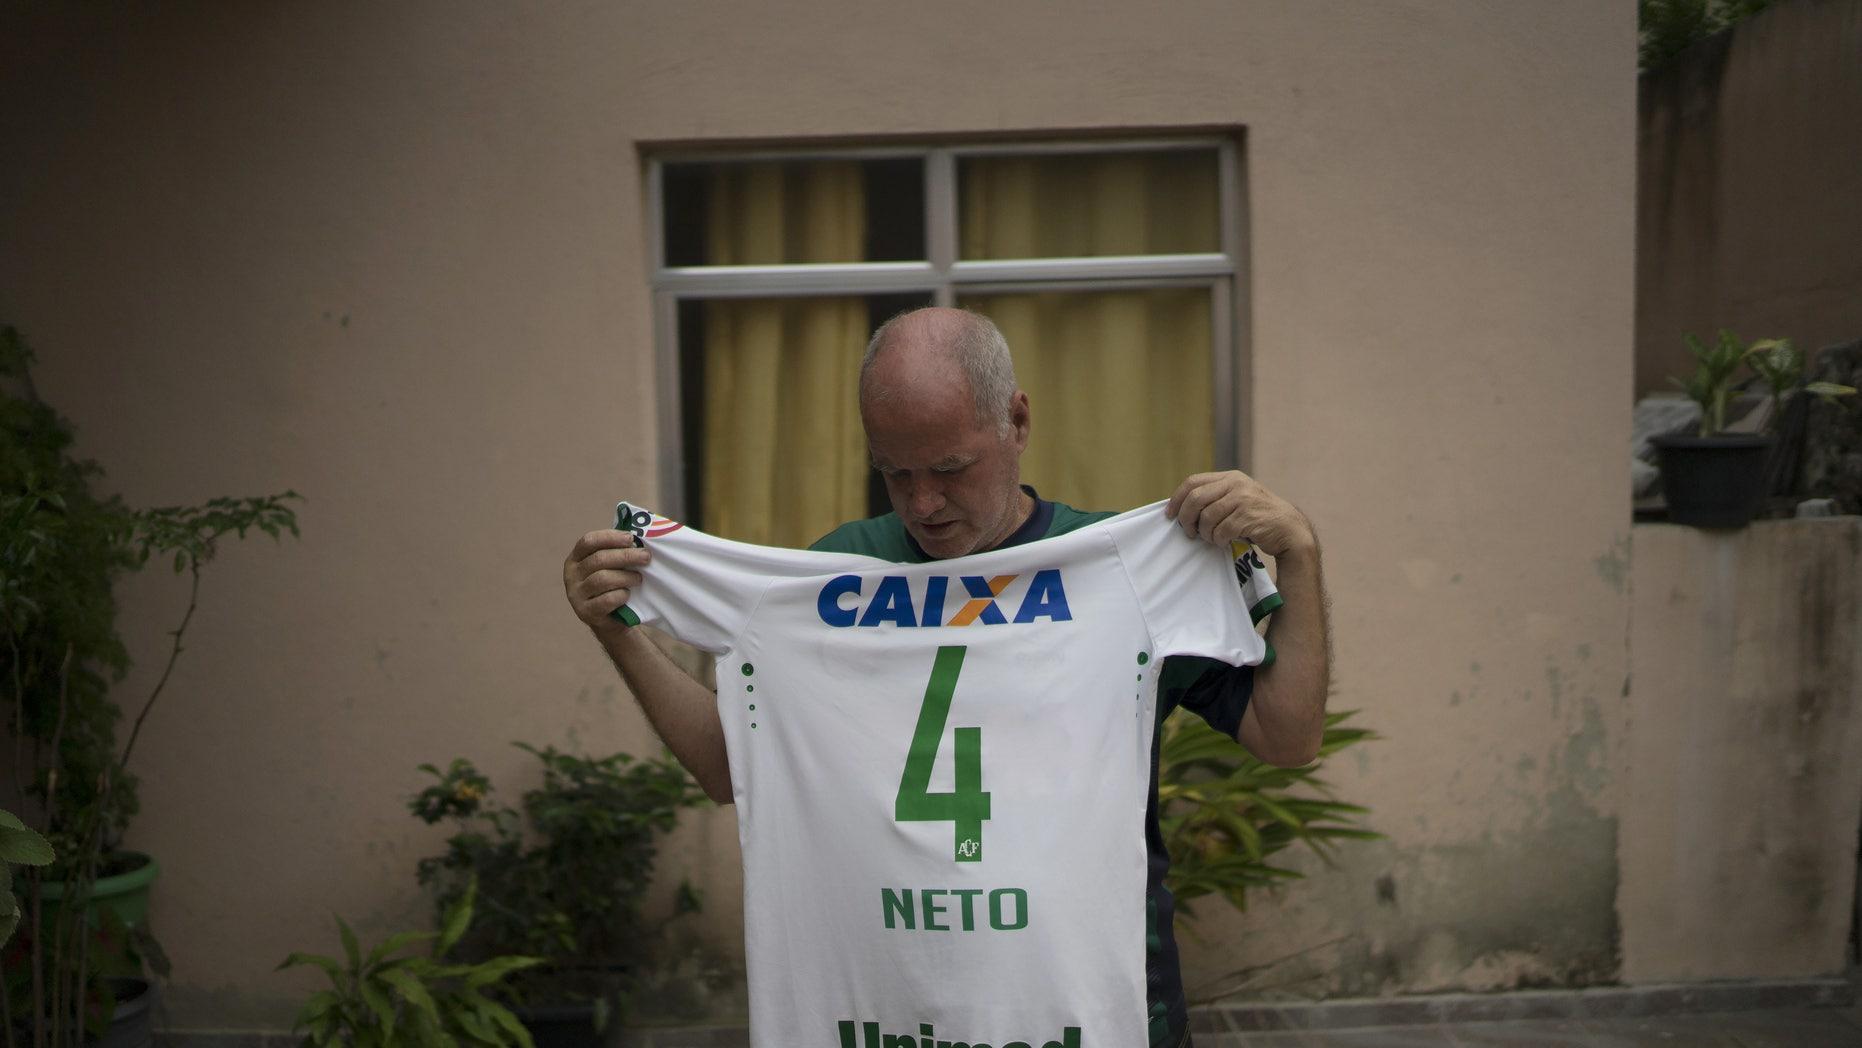 Helam Marinho Zampier Sr. shows the soccer jersey of his son Neto on Thursday, Dec. 1, 2016.